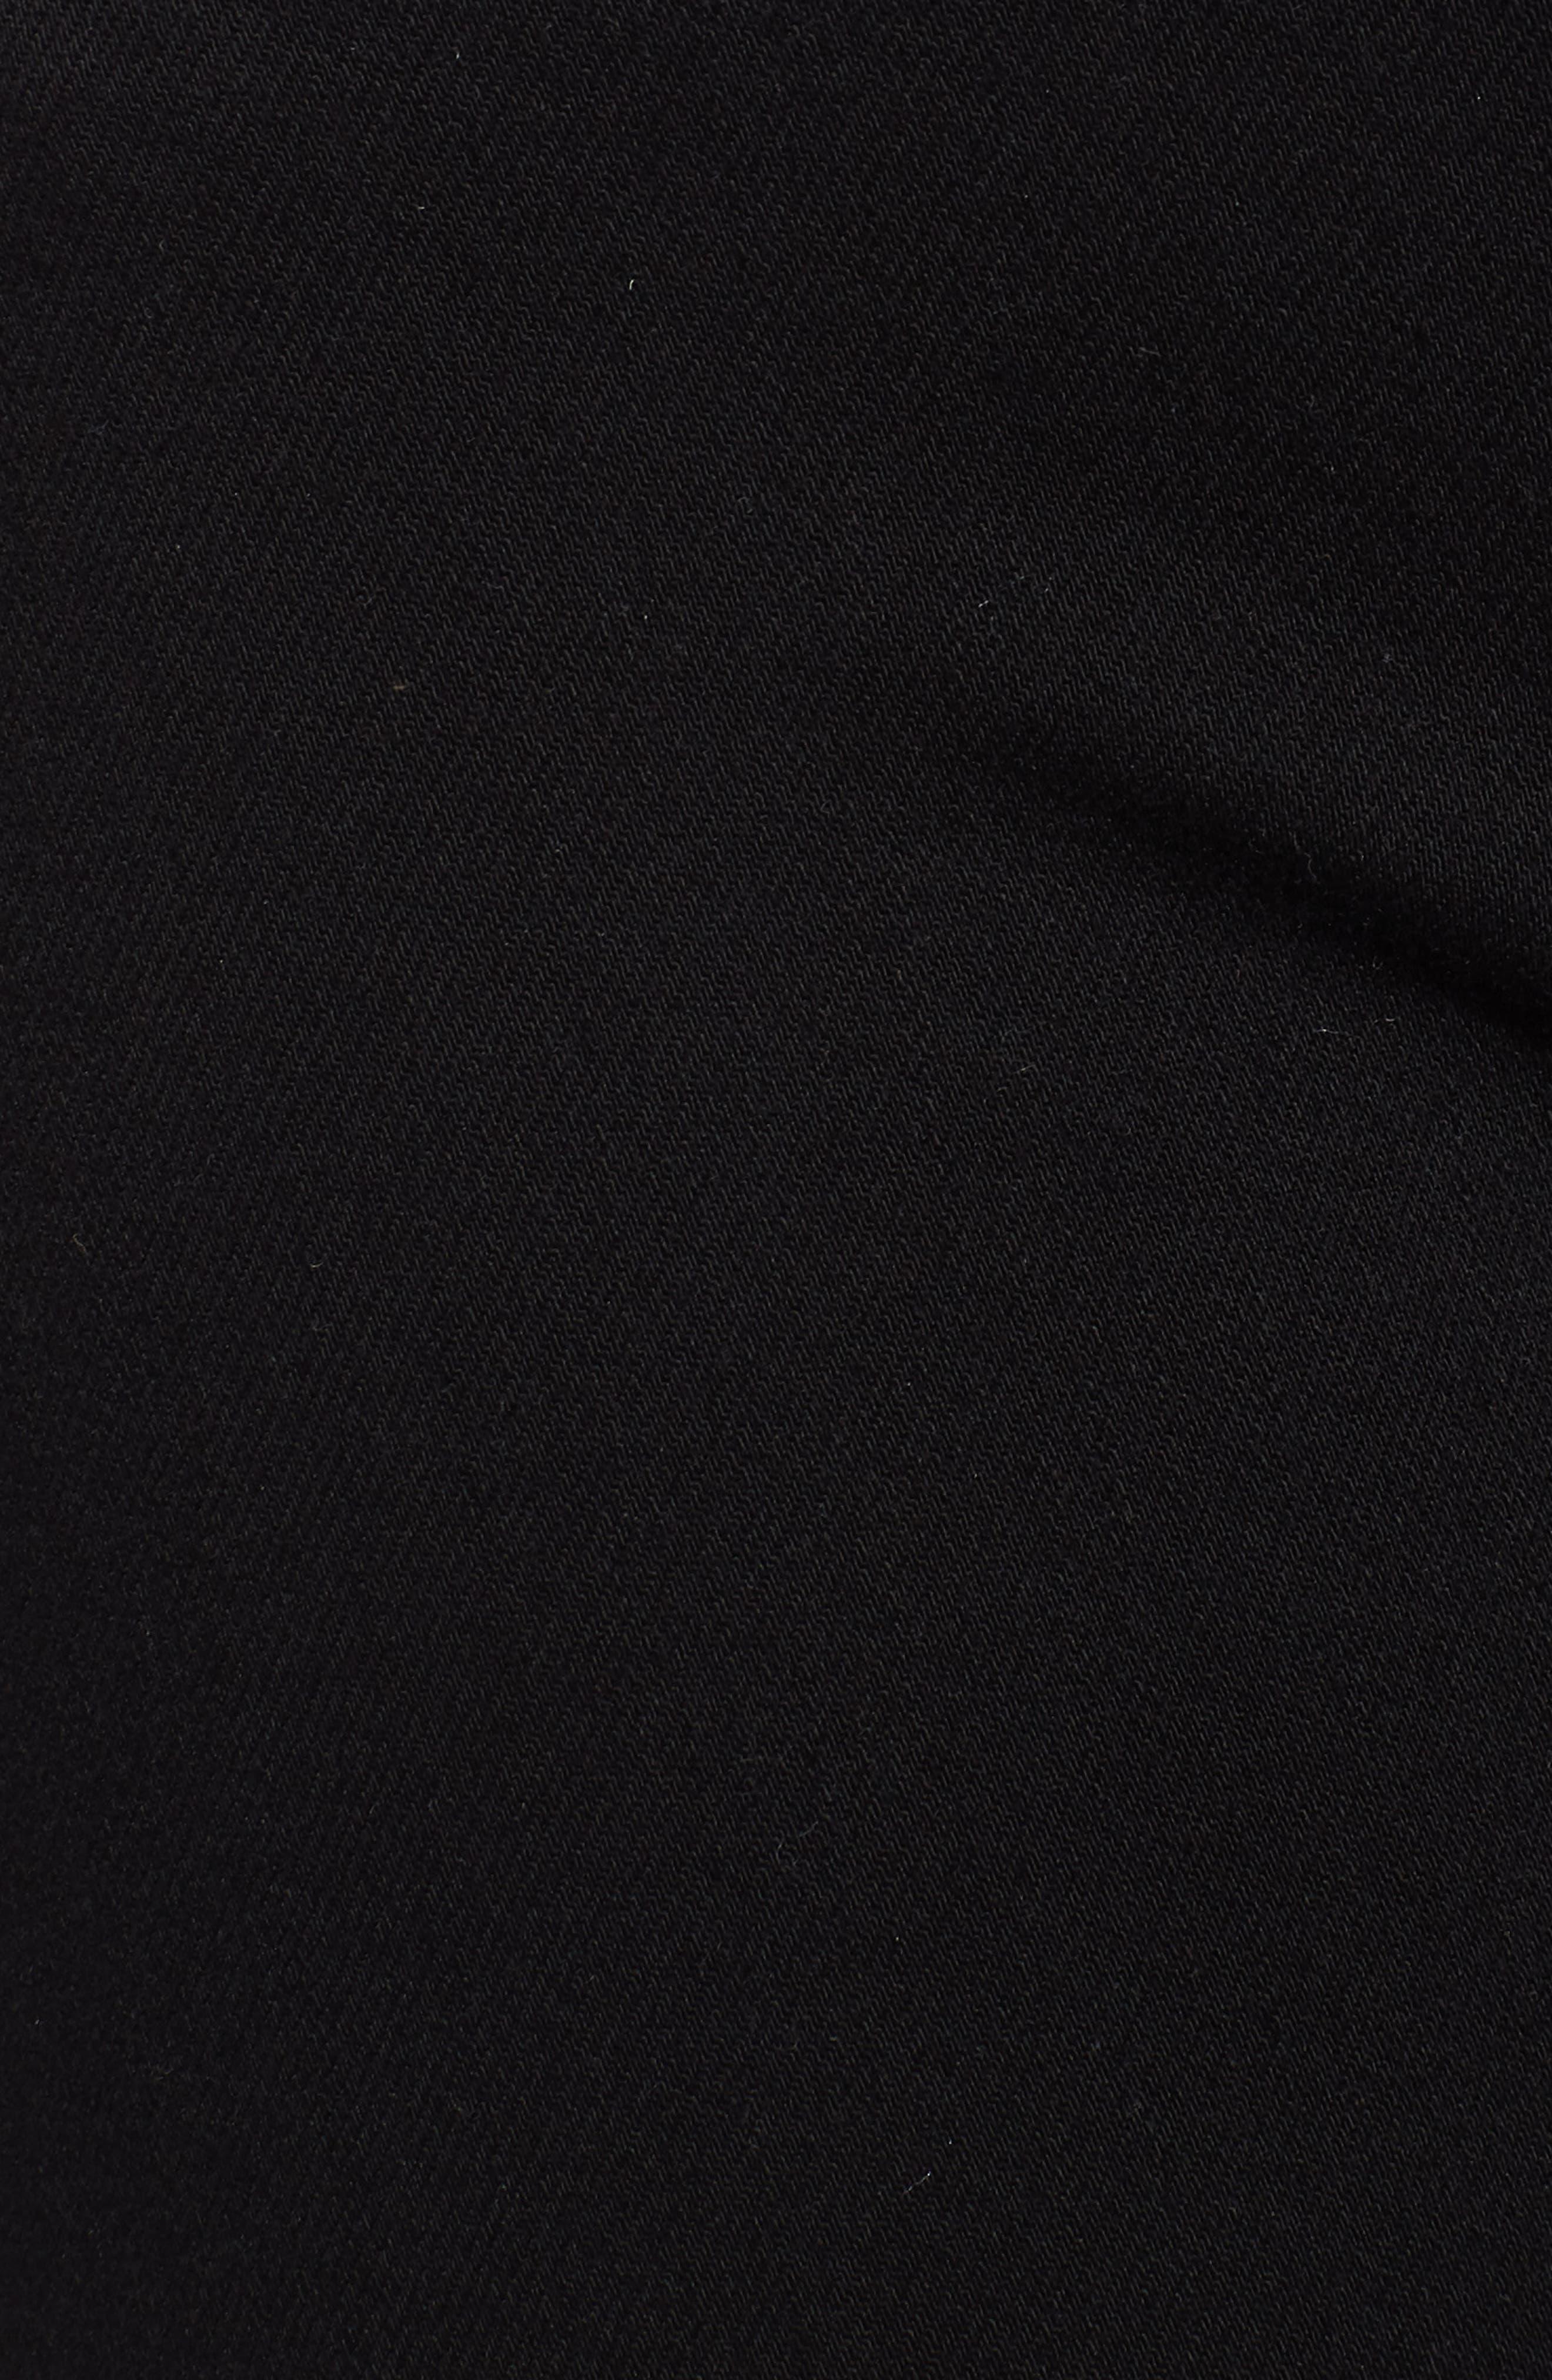 Amelia Cutoff Knee Shorts,                             Alternate thumbnail 6, color,                             Black